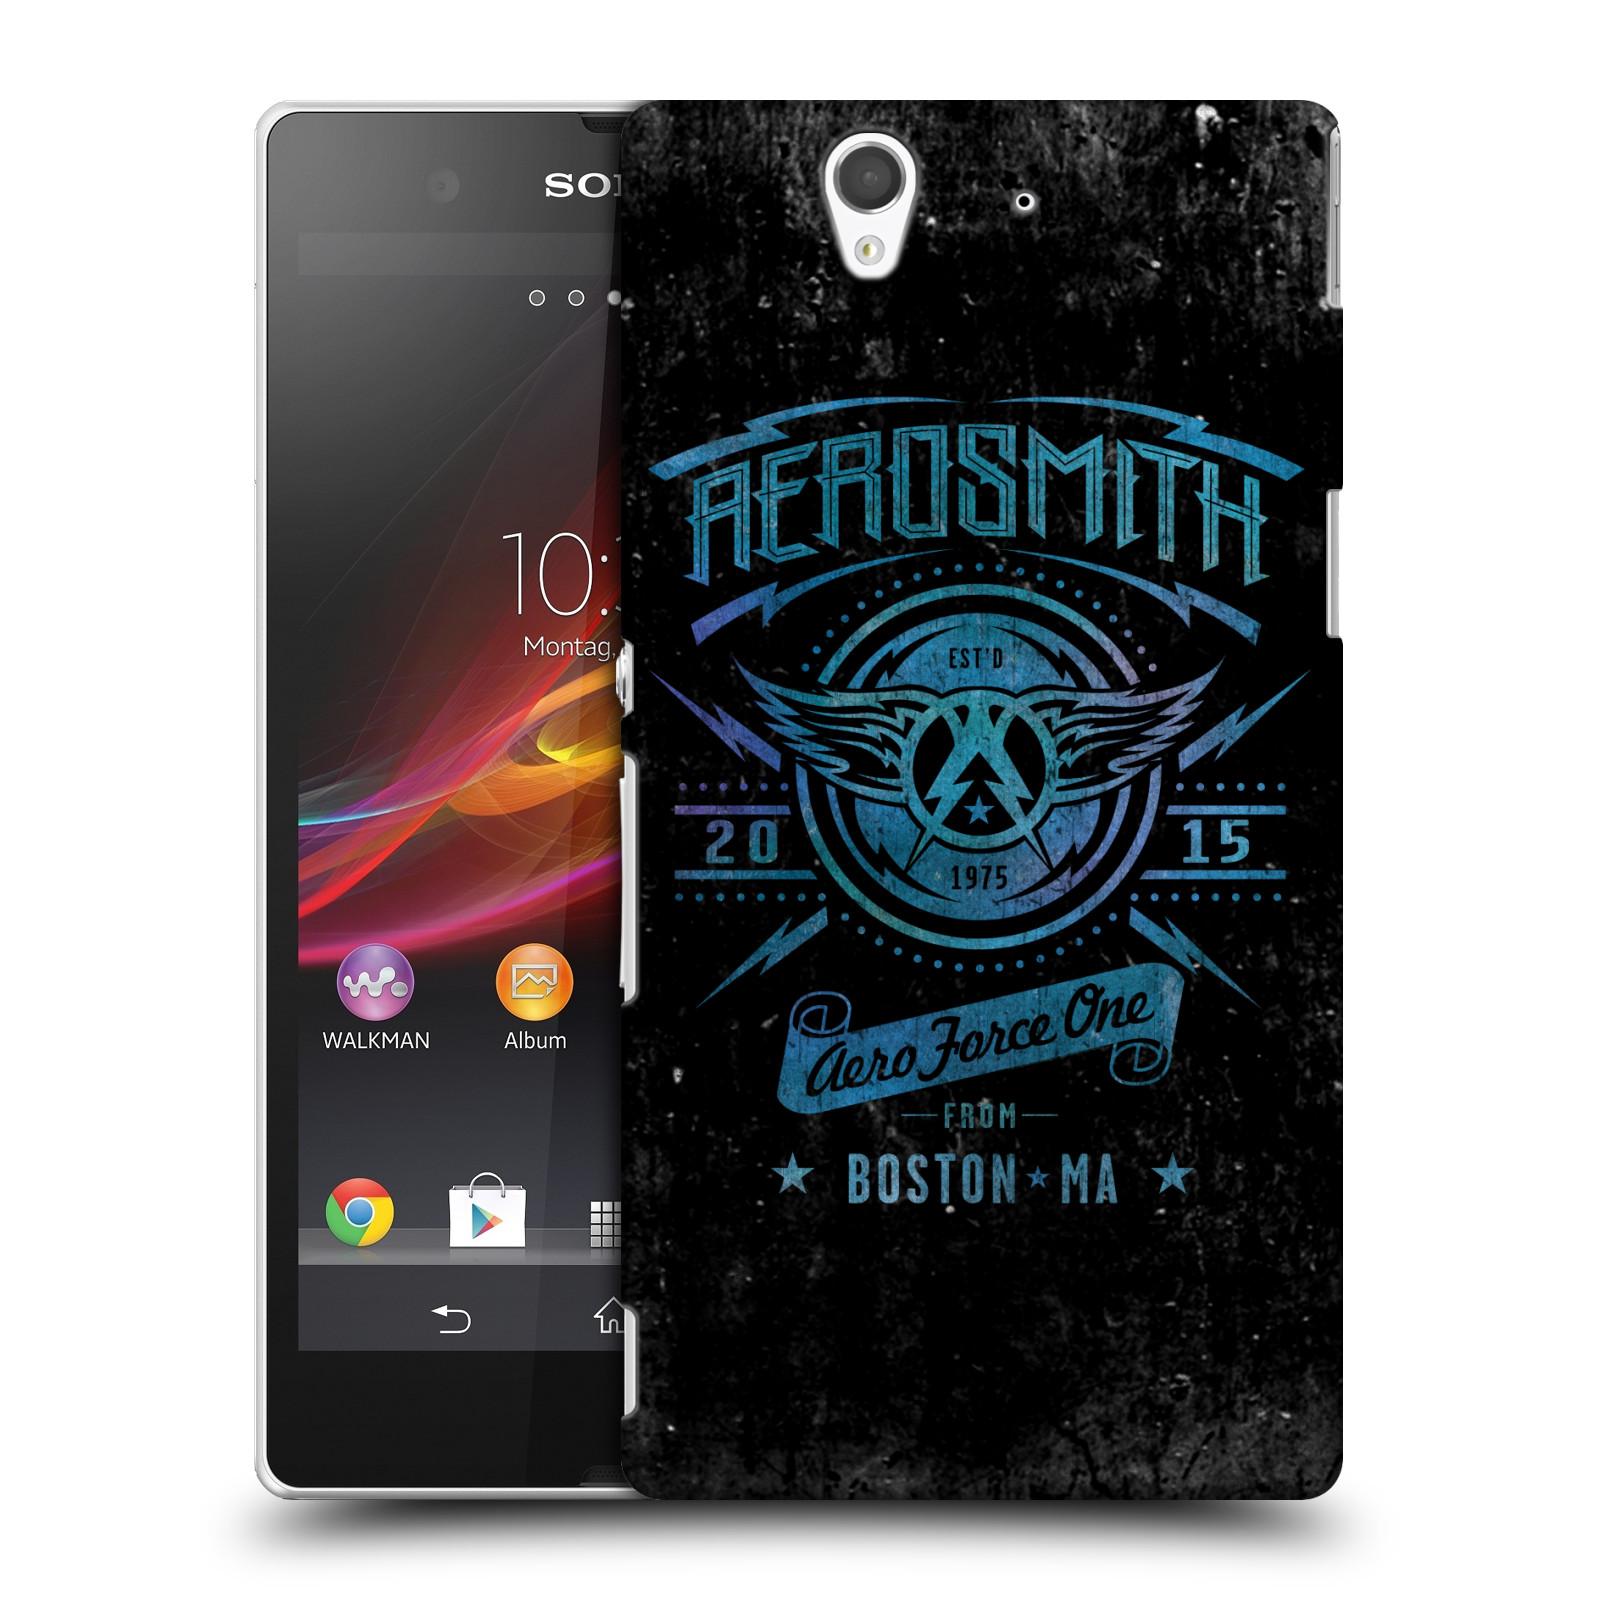 Plastové pouzdro na mobil Sony Xperia Z C6603 HEAD CASE - Aerosmith - Aero Force One